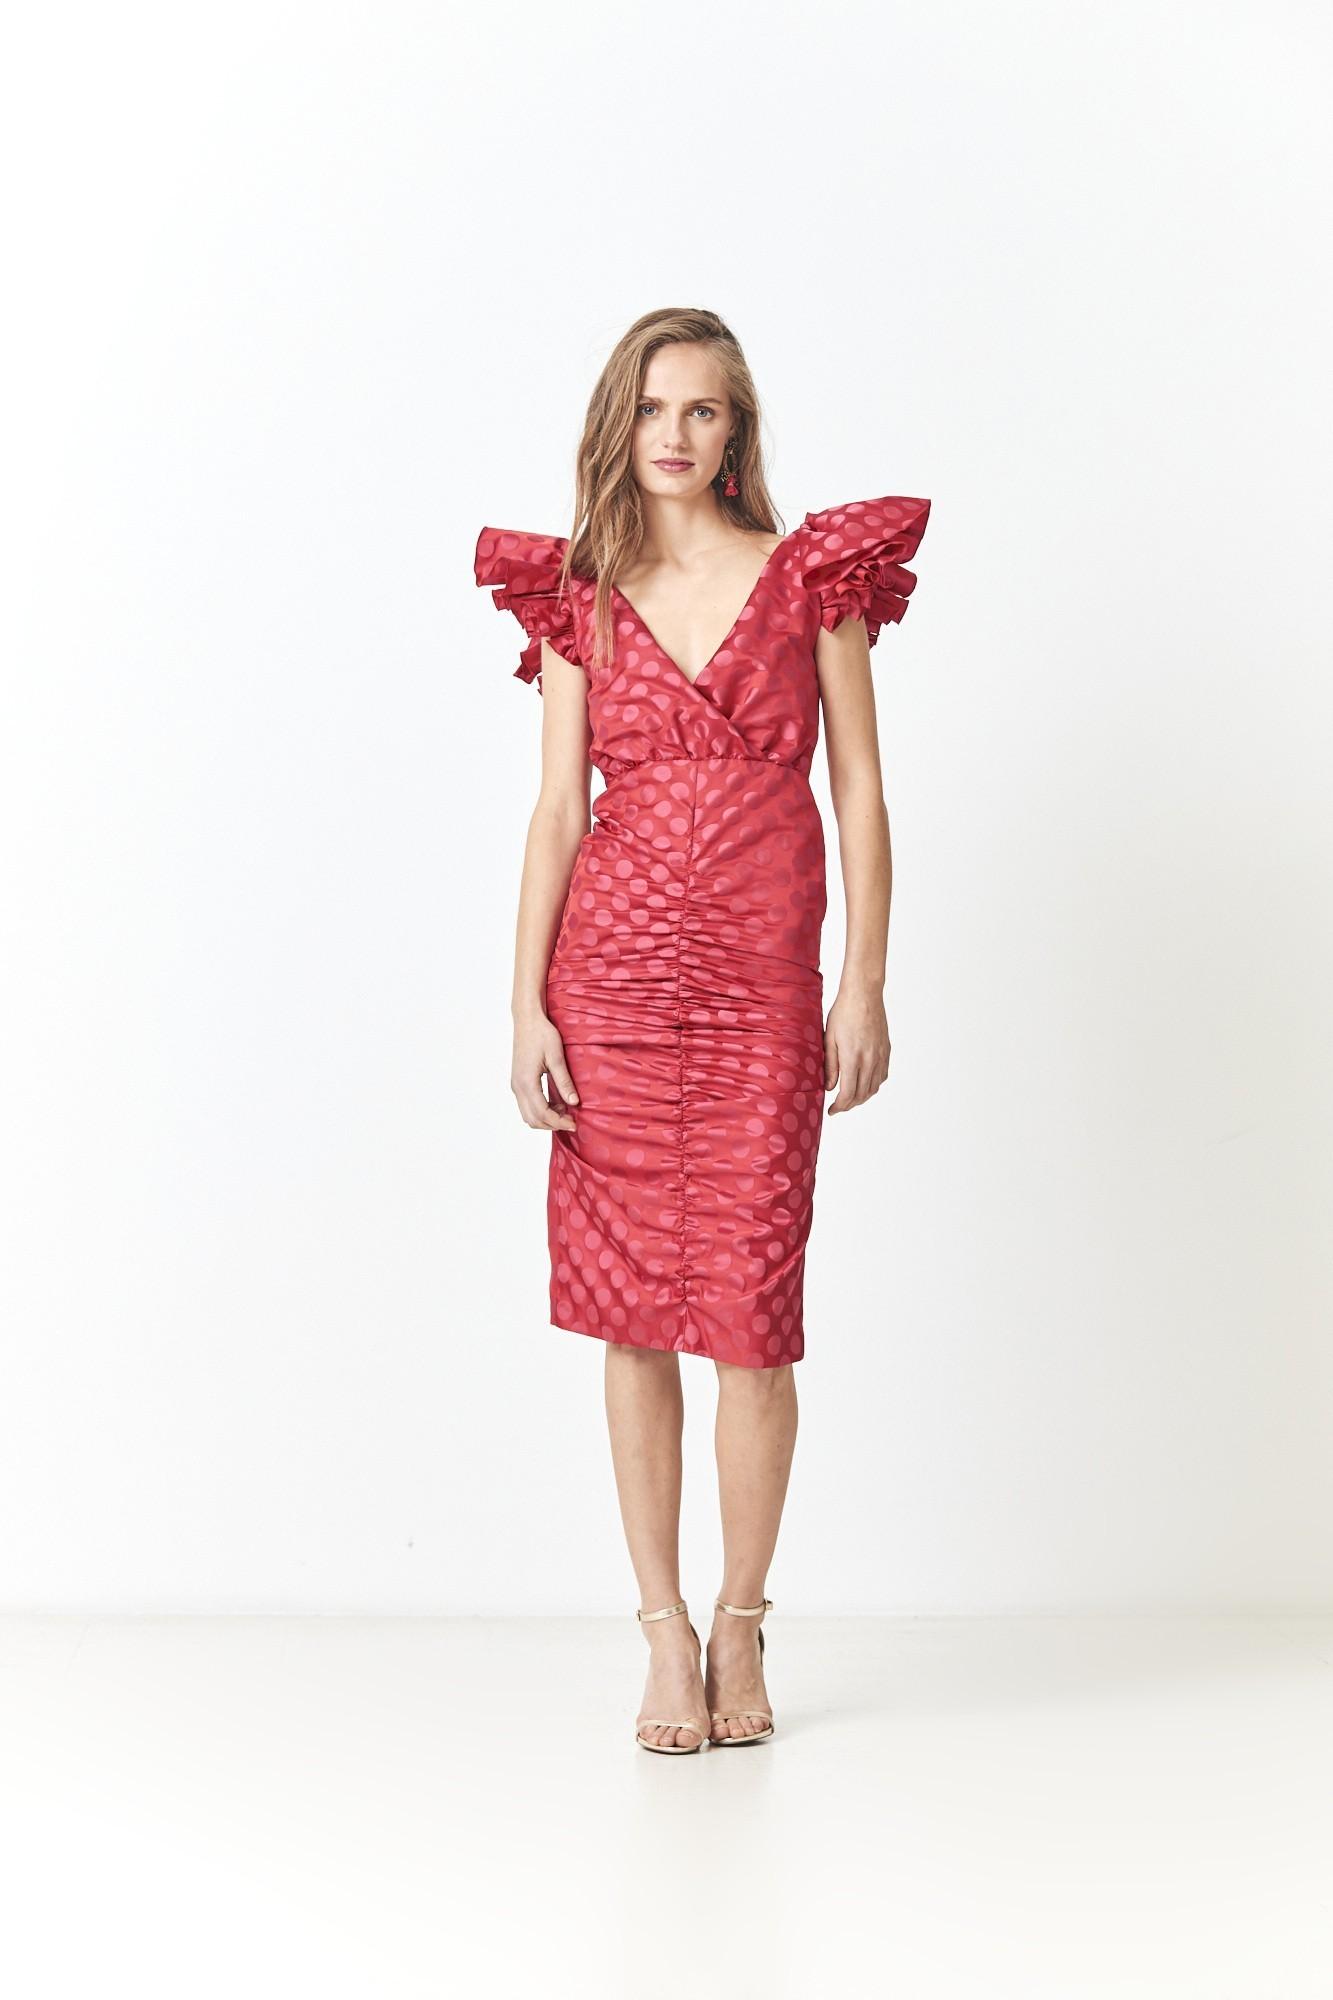 SANTINO DRESS